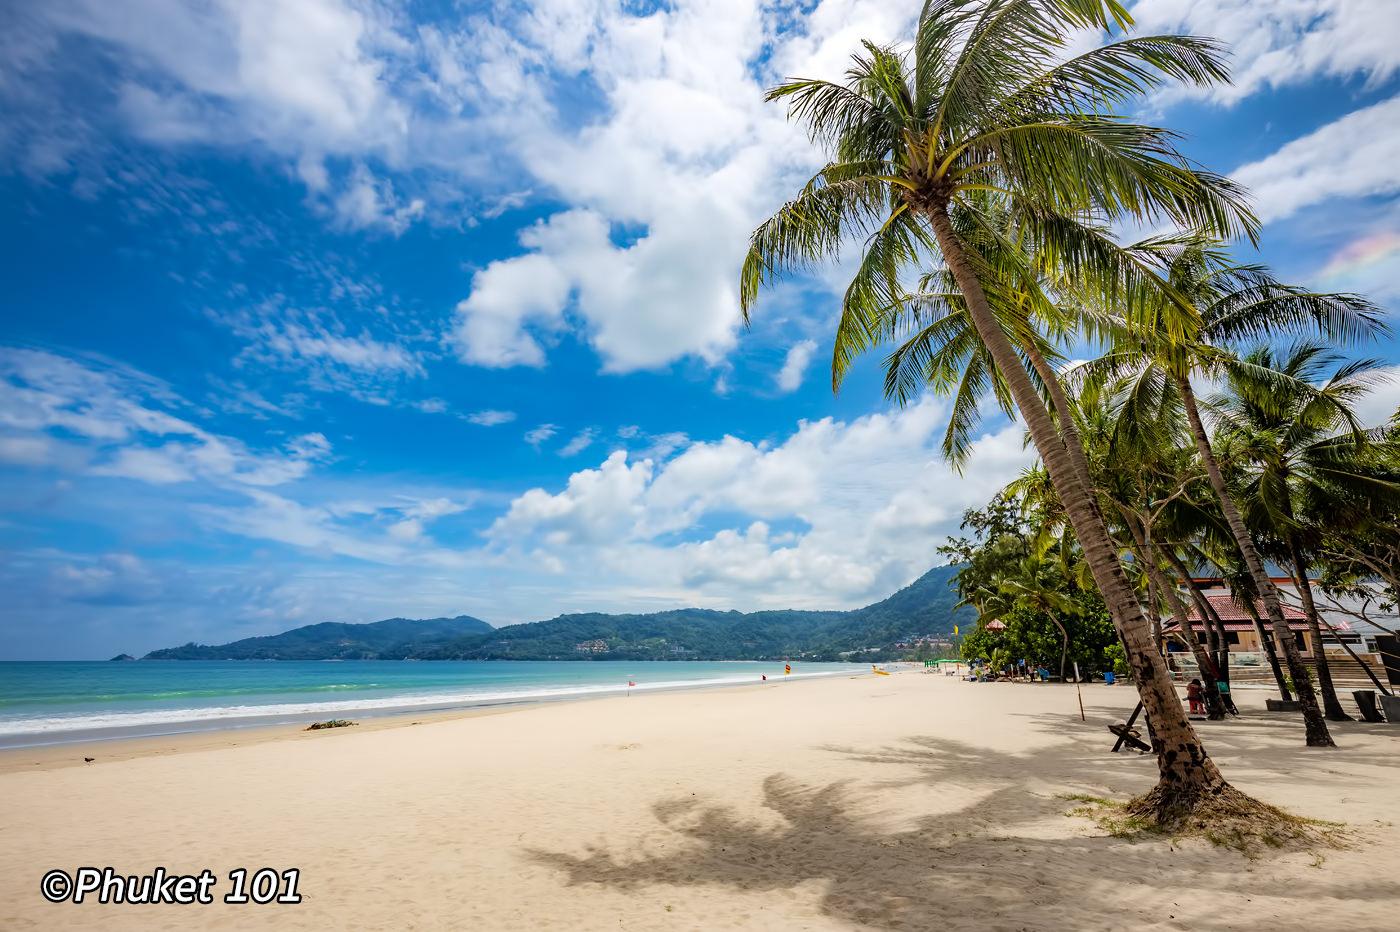 Phuket during COVID19